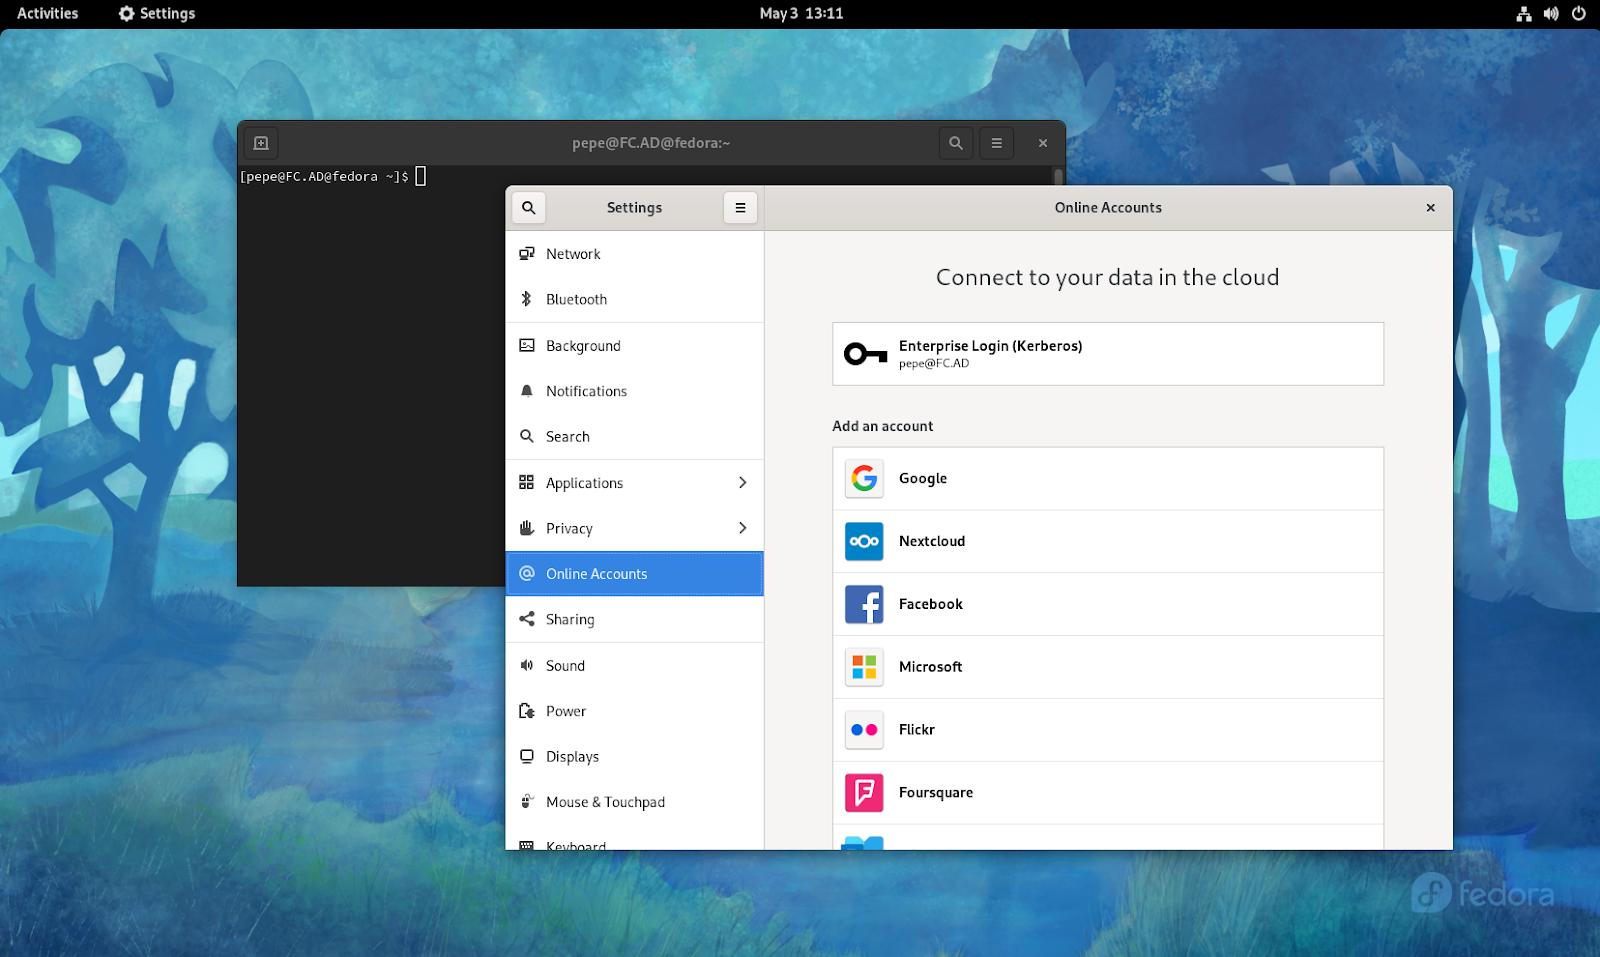 GNOME's Online Accounts screen showing a configured Enterprise Login account.